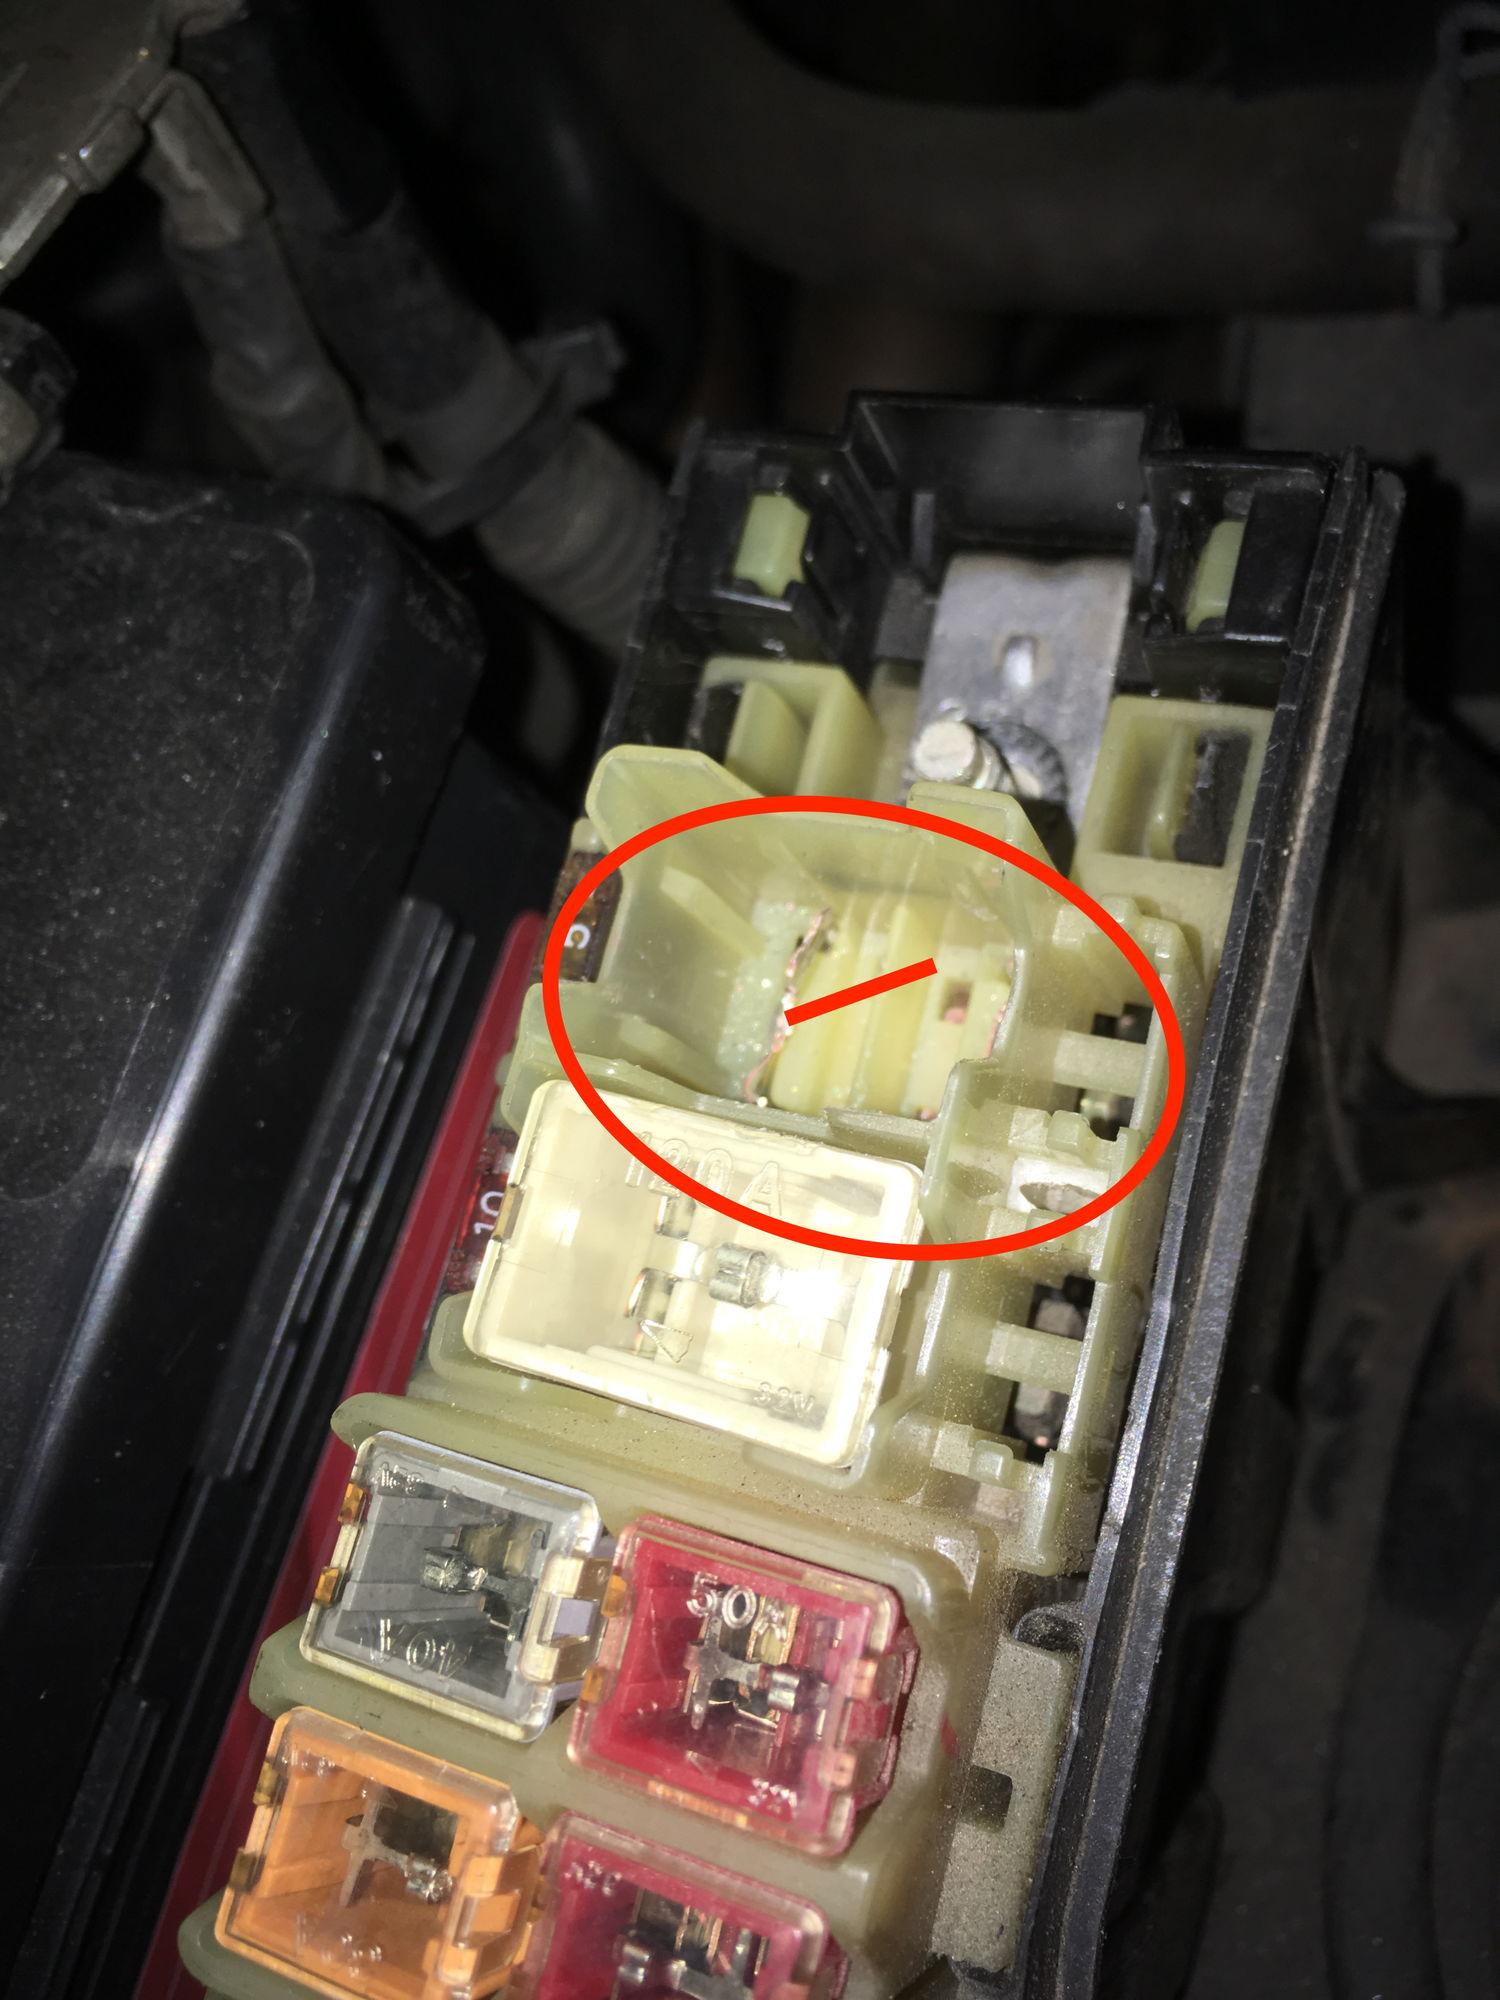 lexus rx330 fuse box navistar international wiring diagrams nash Lexus RX330 Problems  2005 lexus rx330 fuse box location 2005 lexus rx330 fuse box diagram Lexus RX330 Parts